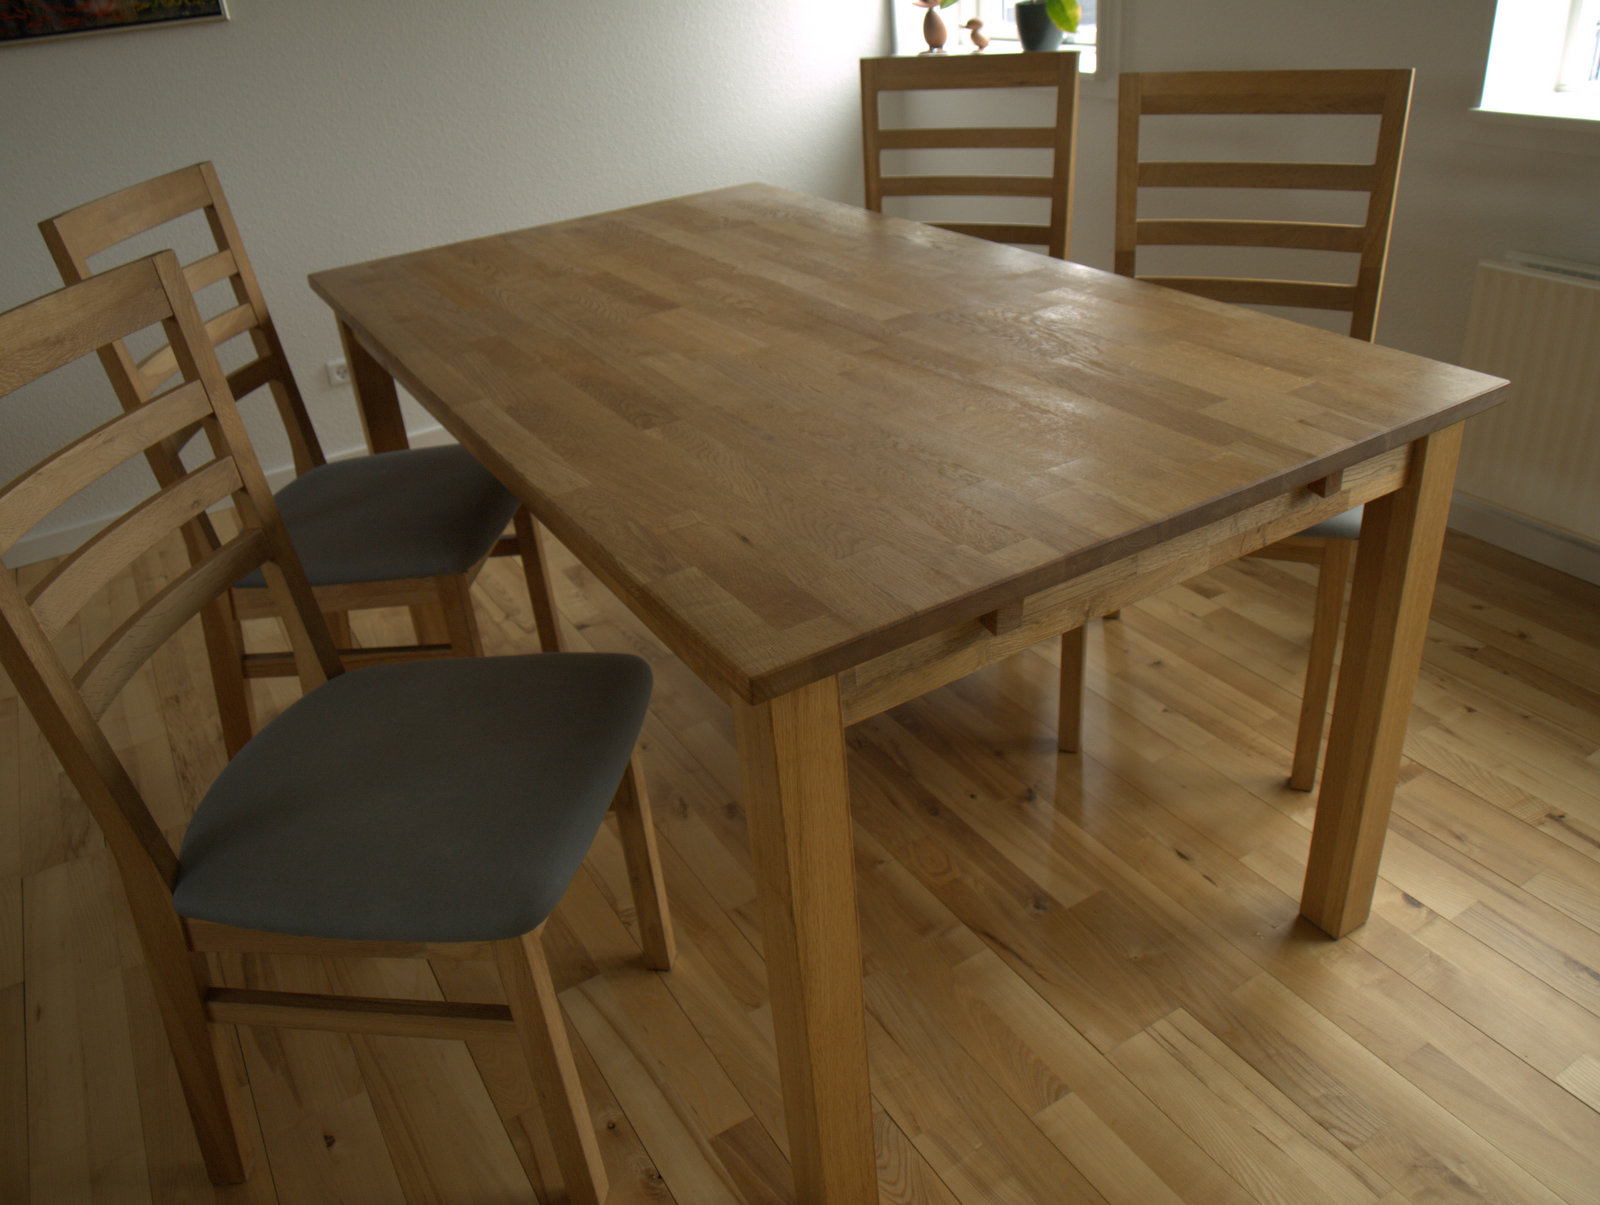 Det gamle spisebord